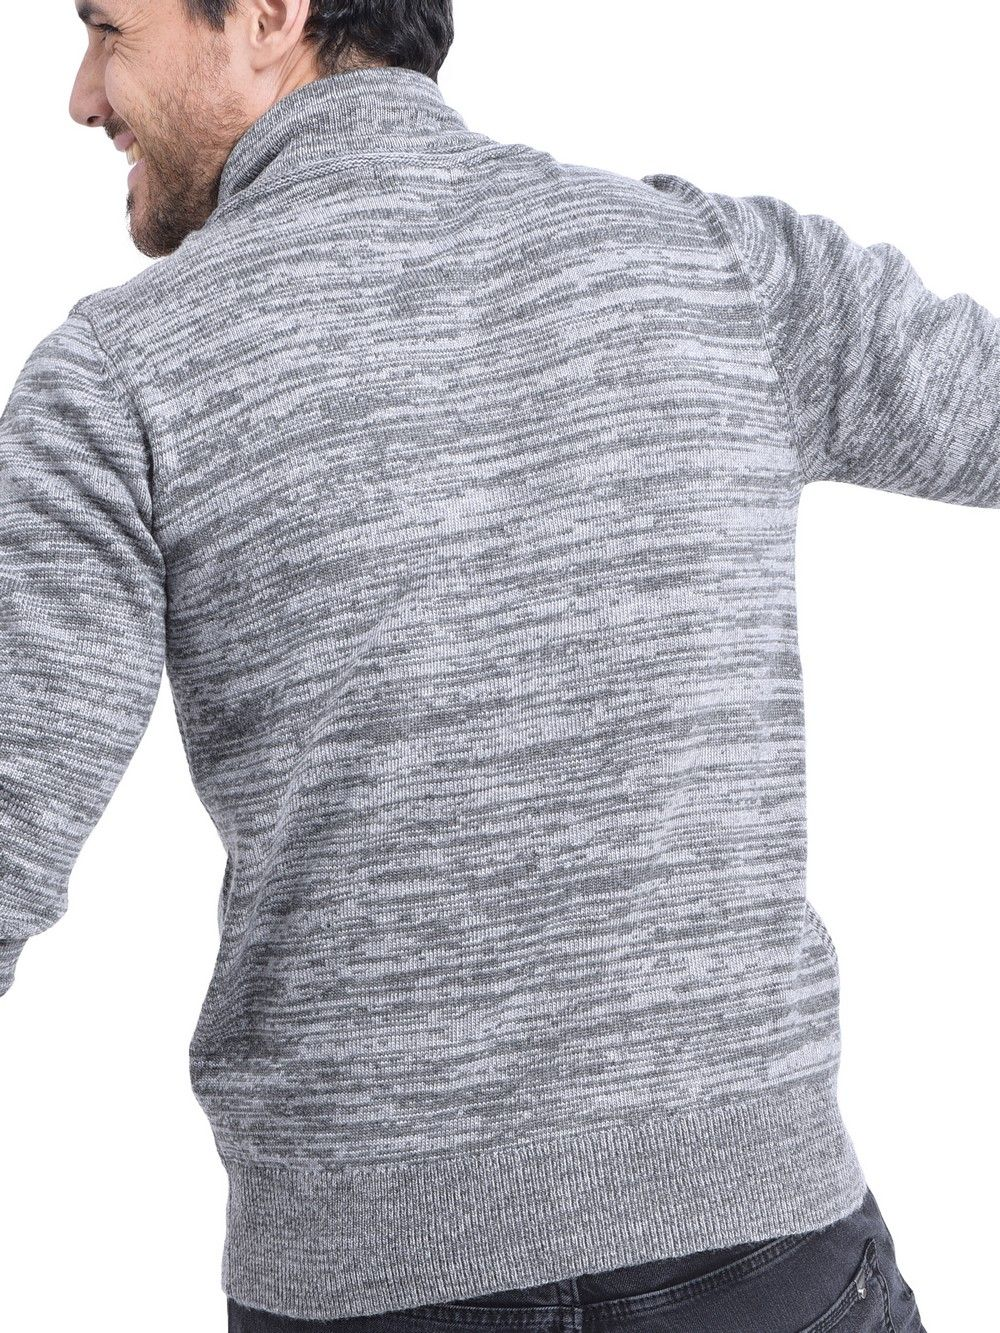 William De Faye Shawl Collar Jacquard Sweater with Cords in Grey